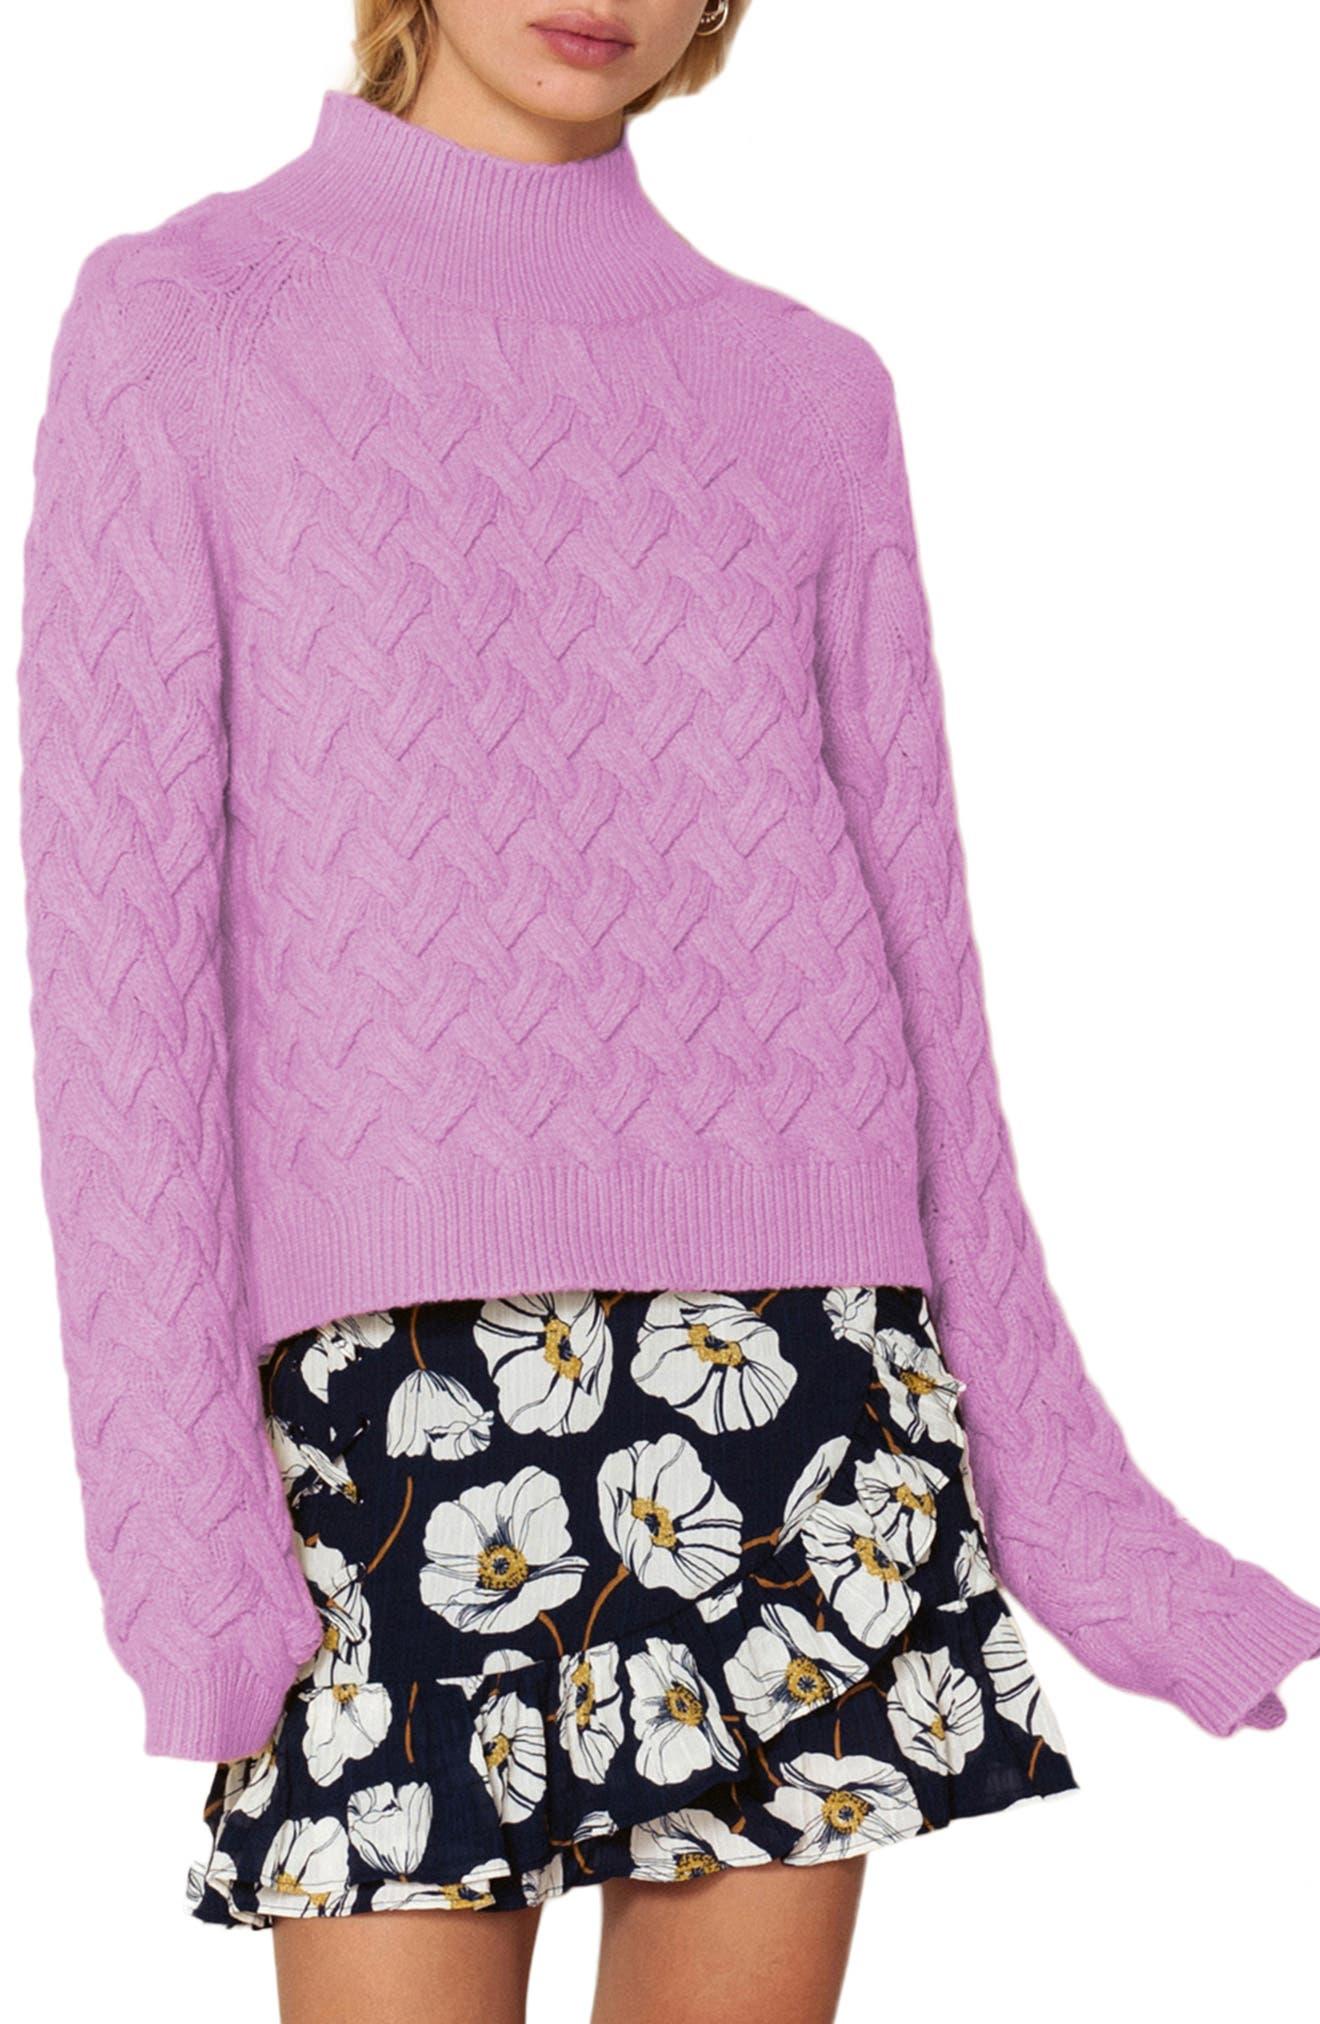 Adele Turtleneck Sweater,                             Main thumbnail 1, color,                             534